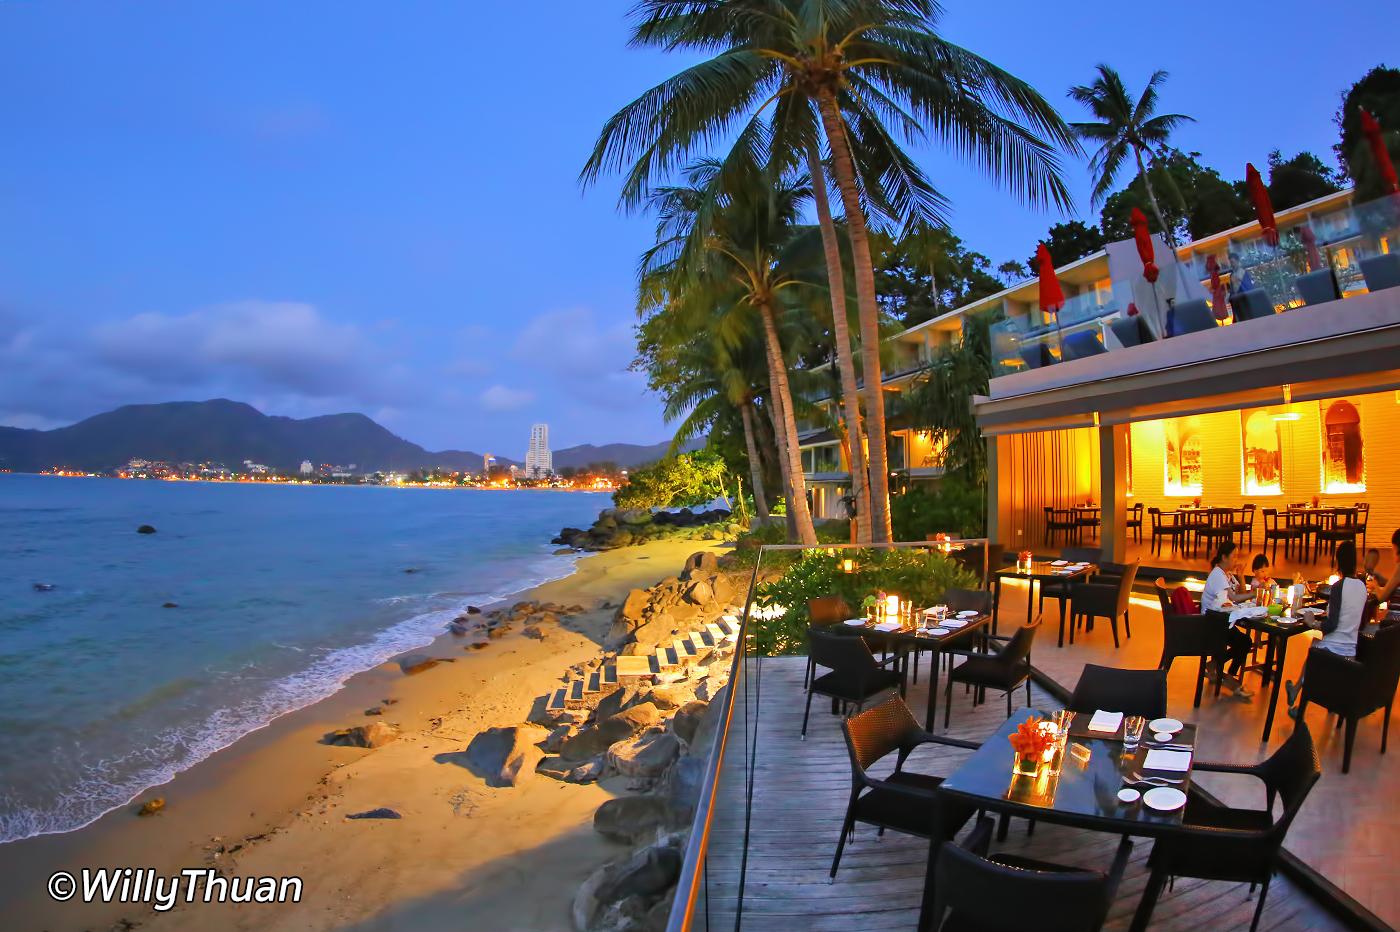 10 Great Romantic Restaurants in Phuket